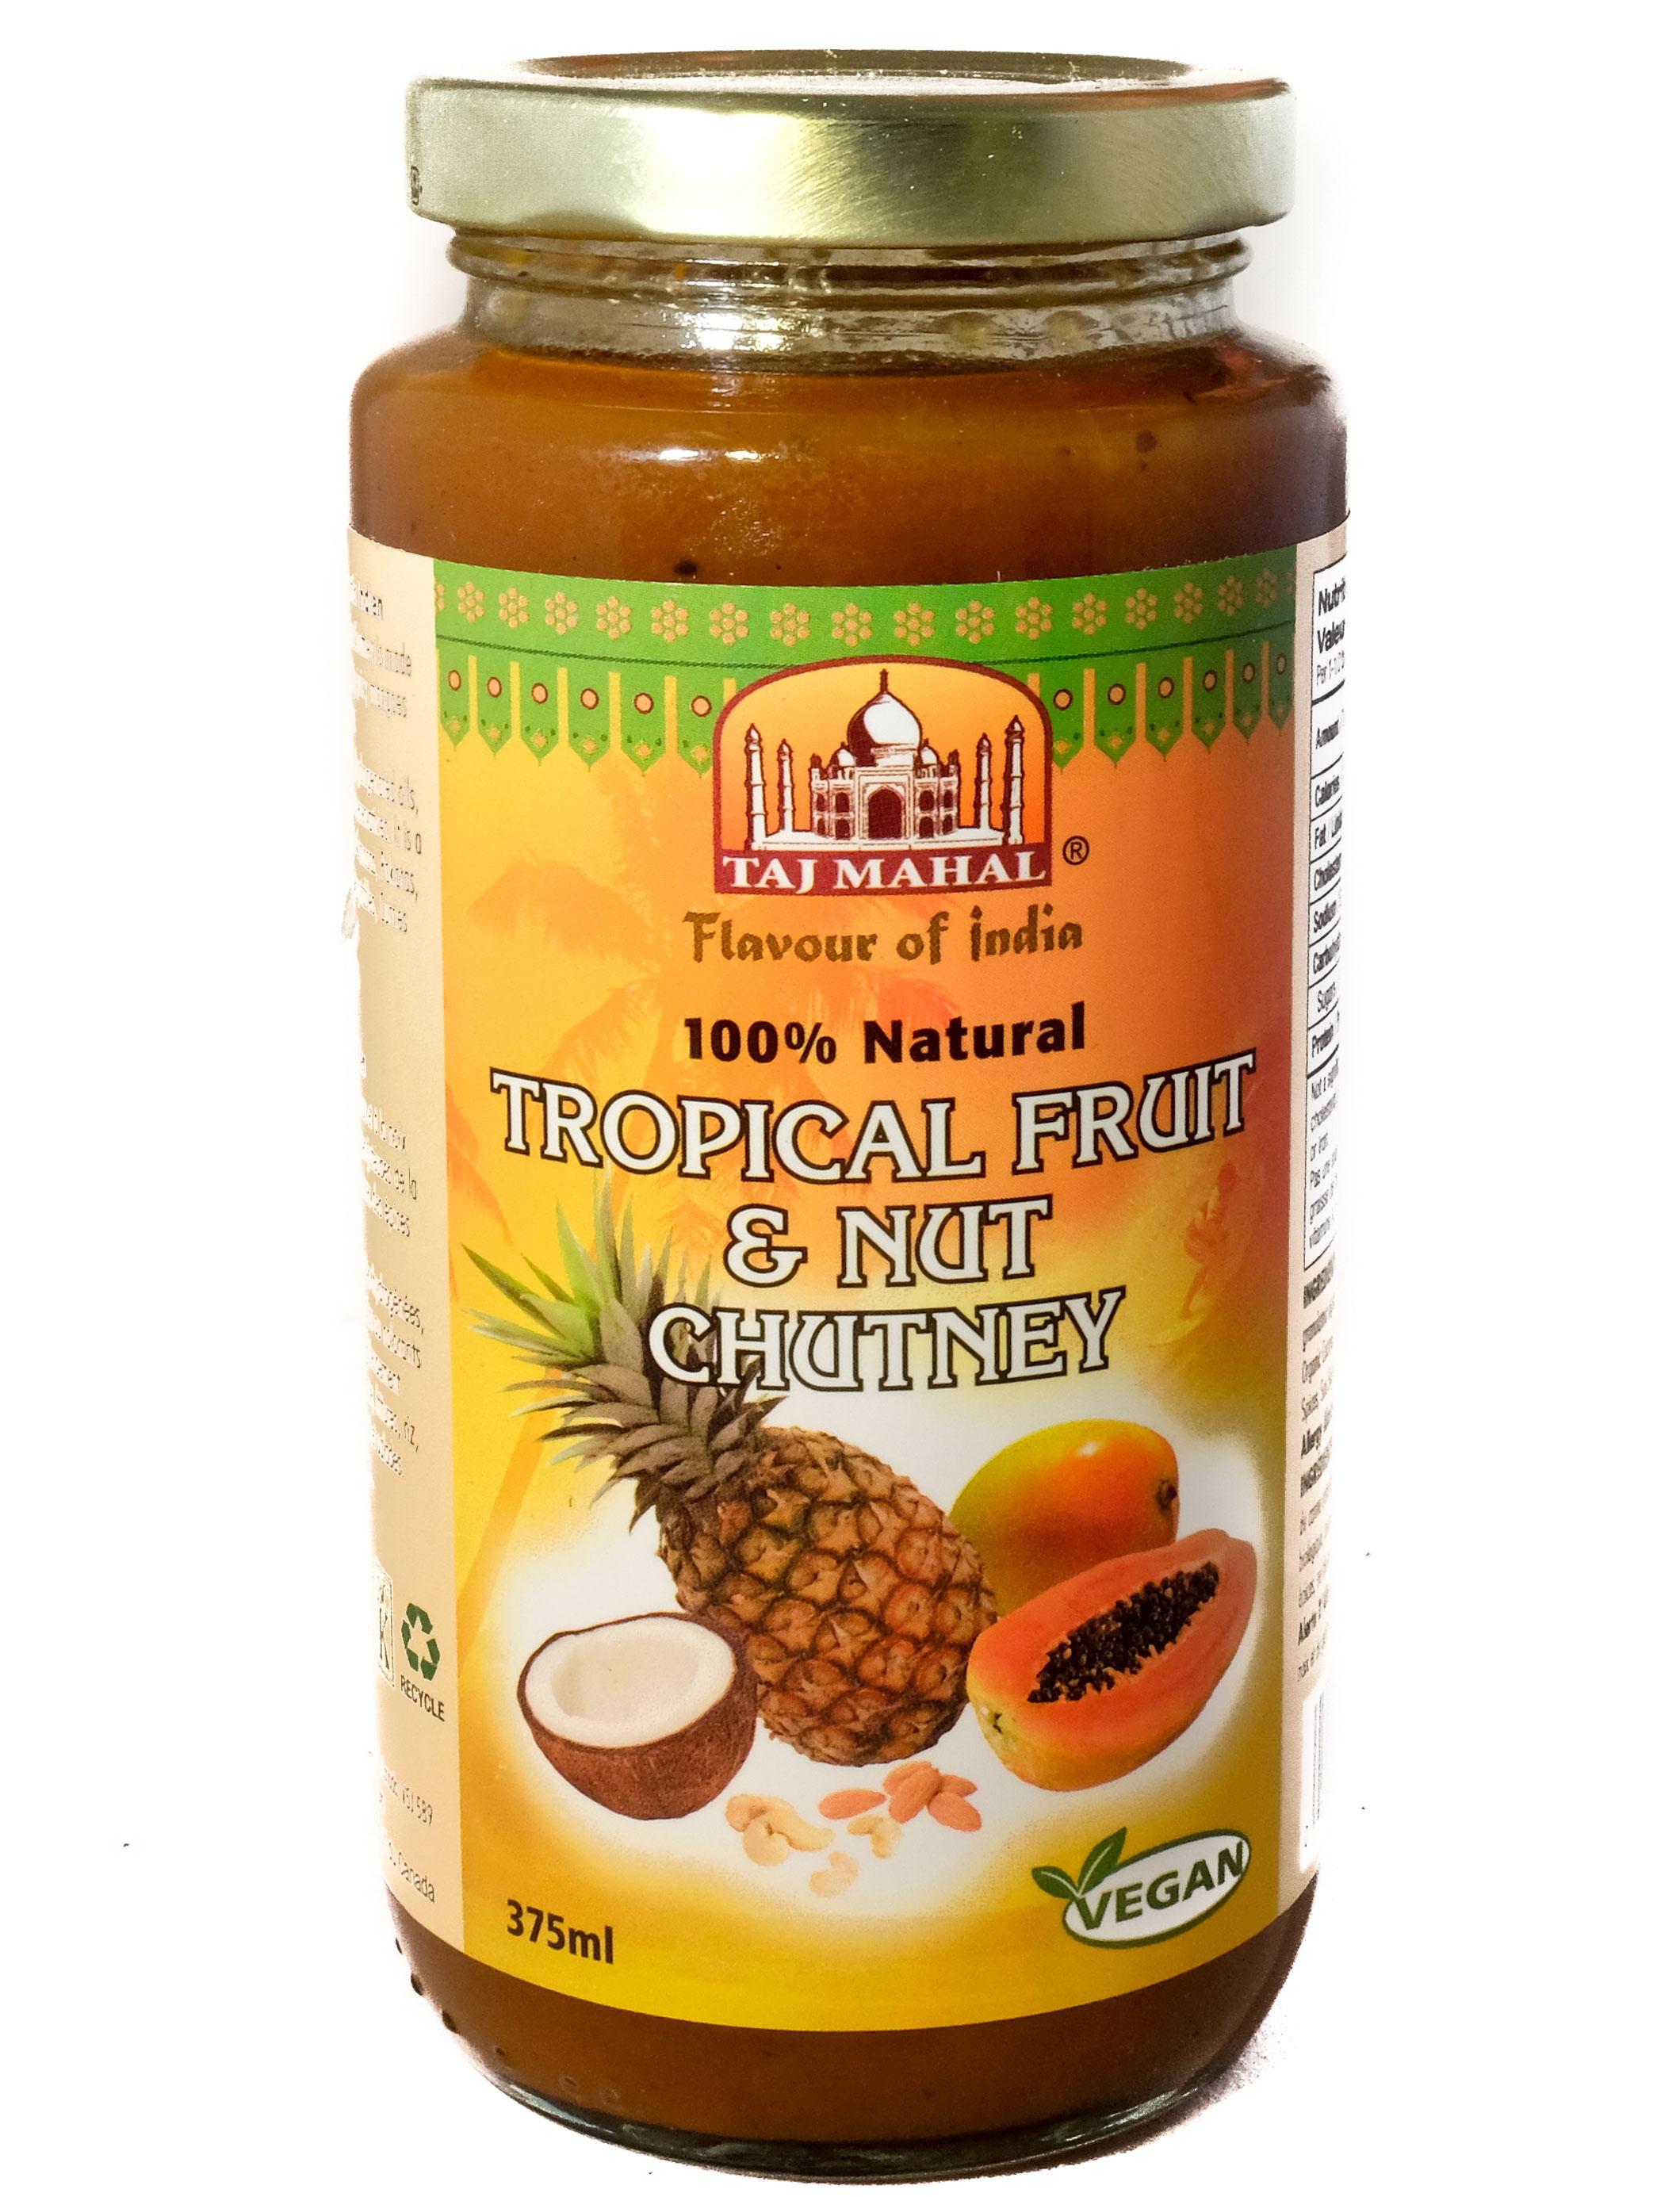 Tropical Fruit & Nut Chutney